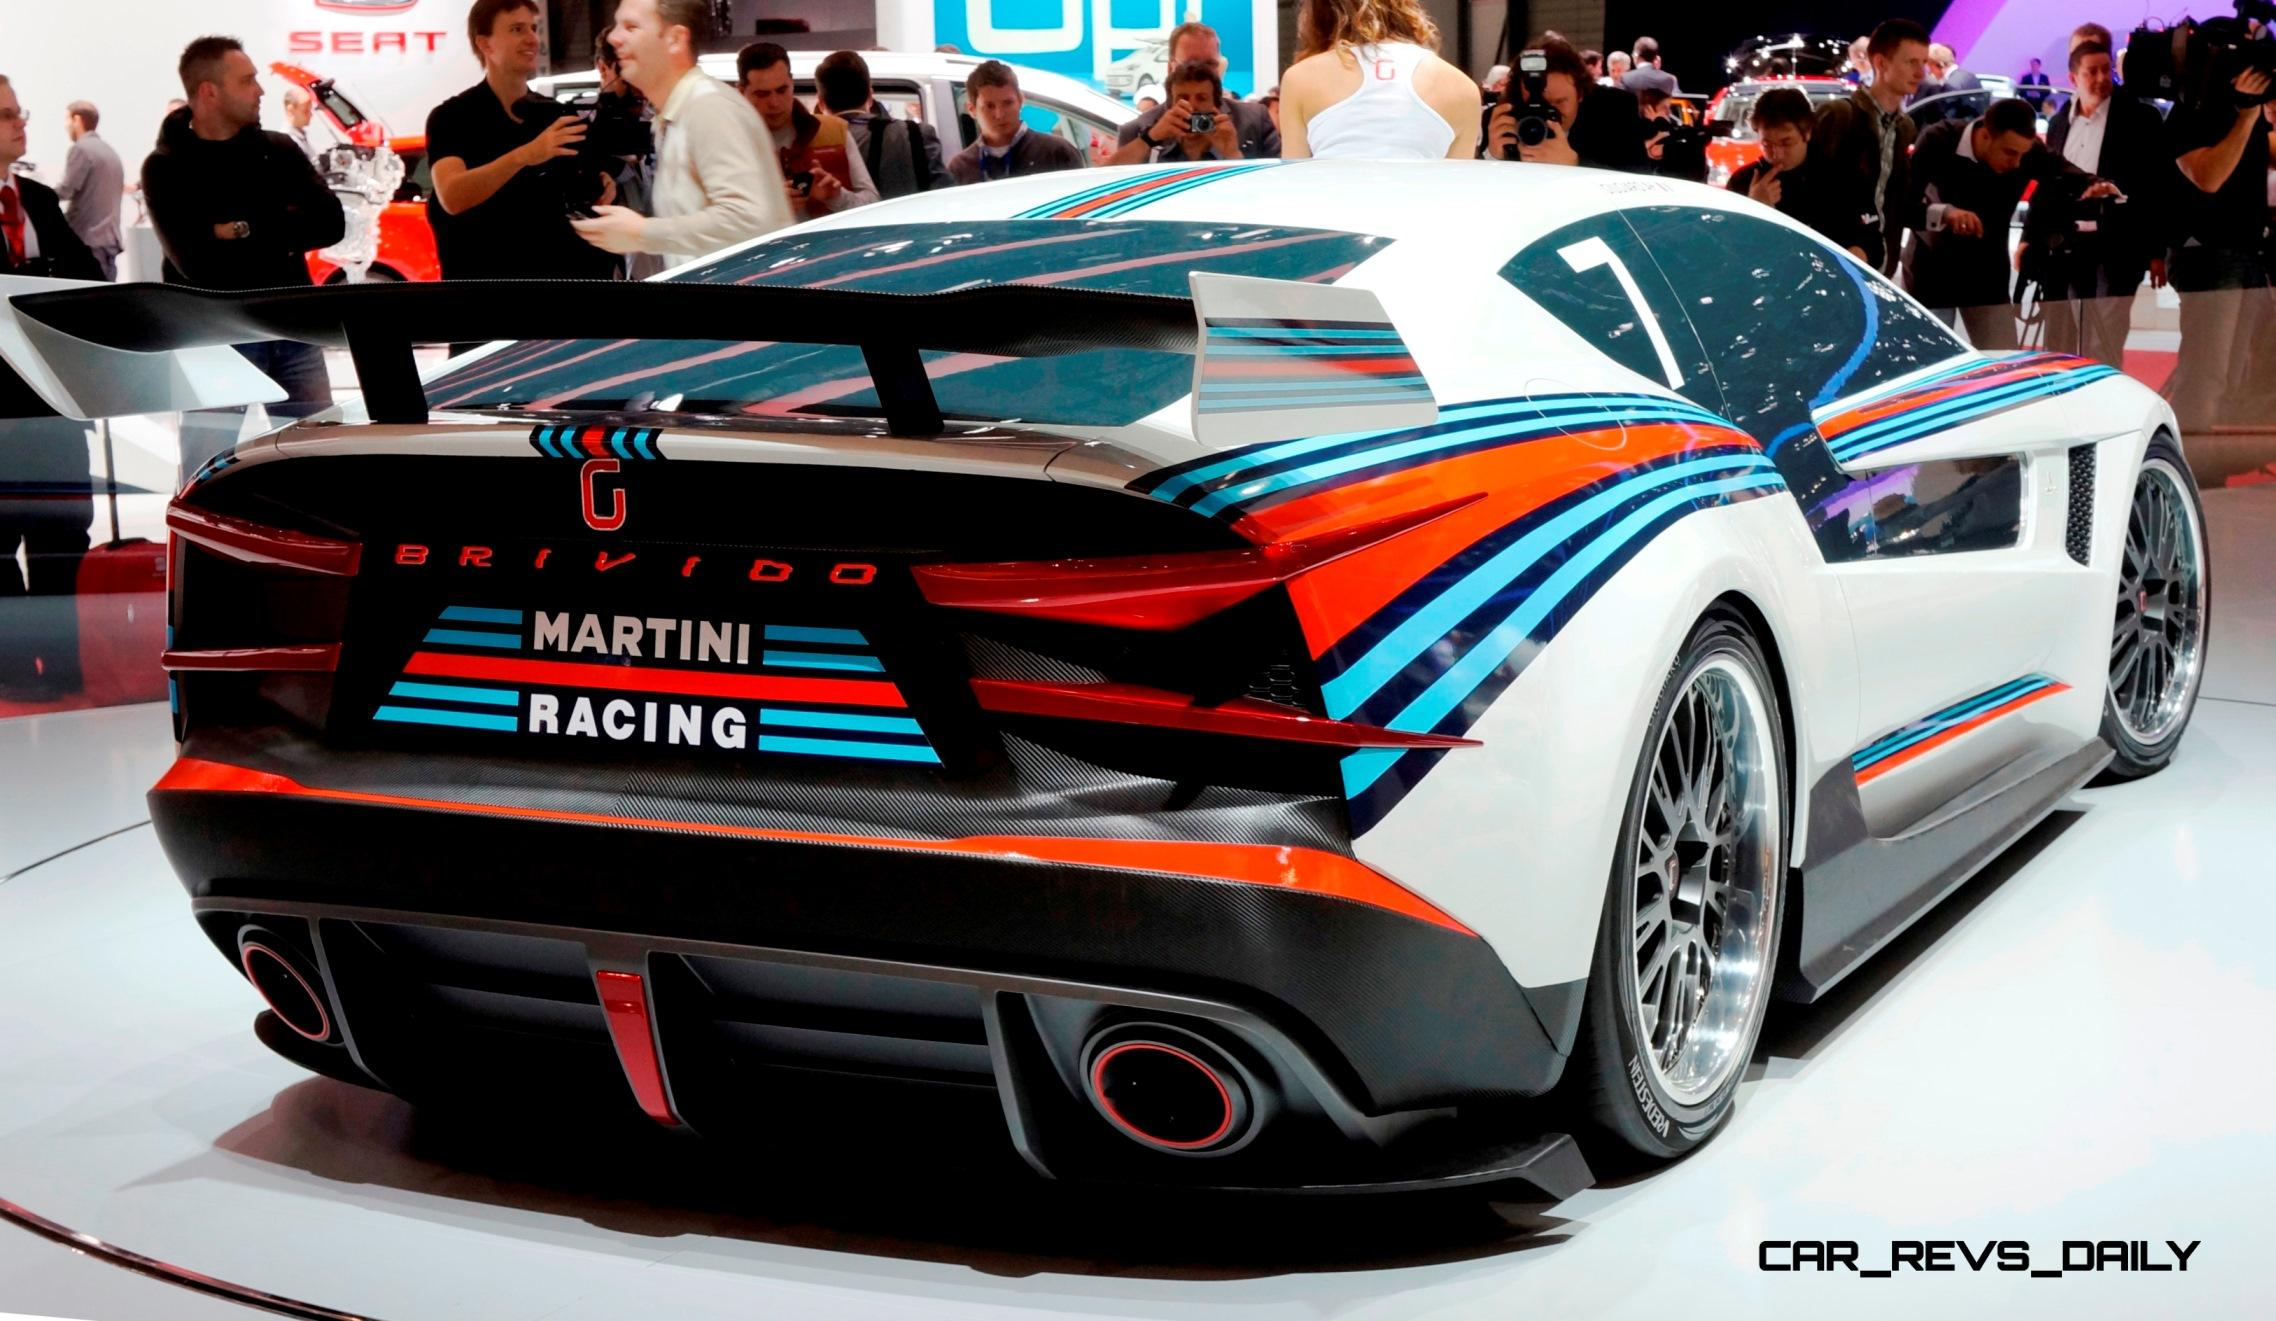 2012 Giugiaro Brivido Martini Racing Honors Lancia Beta